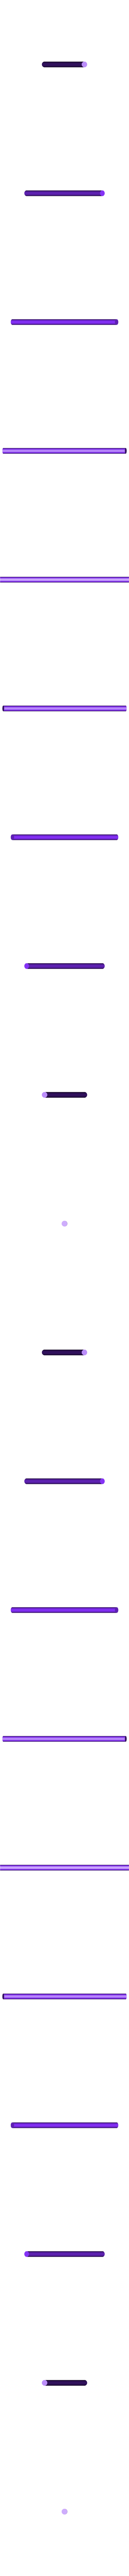 pole.stl Download STL file Pole Dancer - Pen Holder • Object to 3D print, 3D-mon